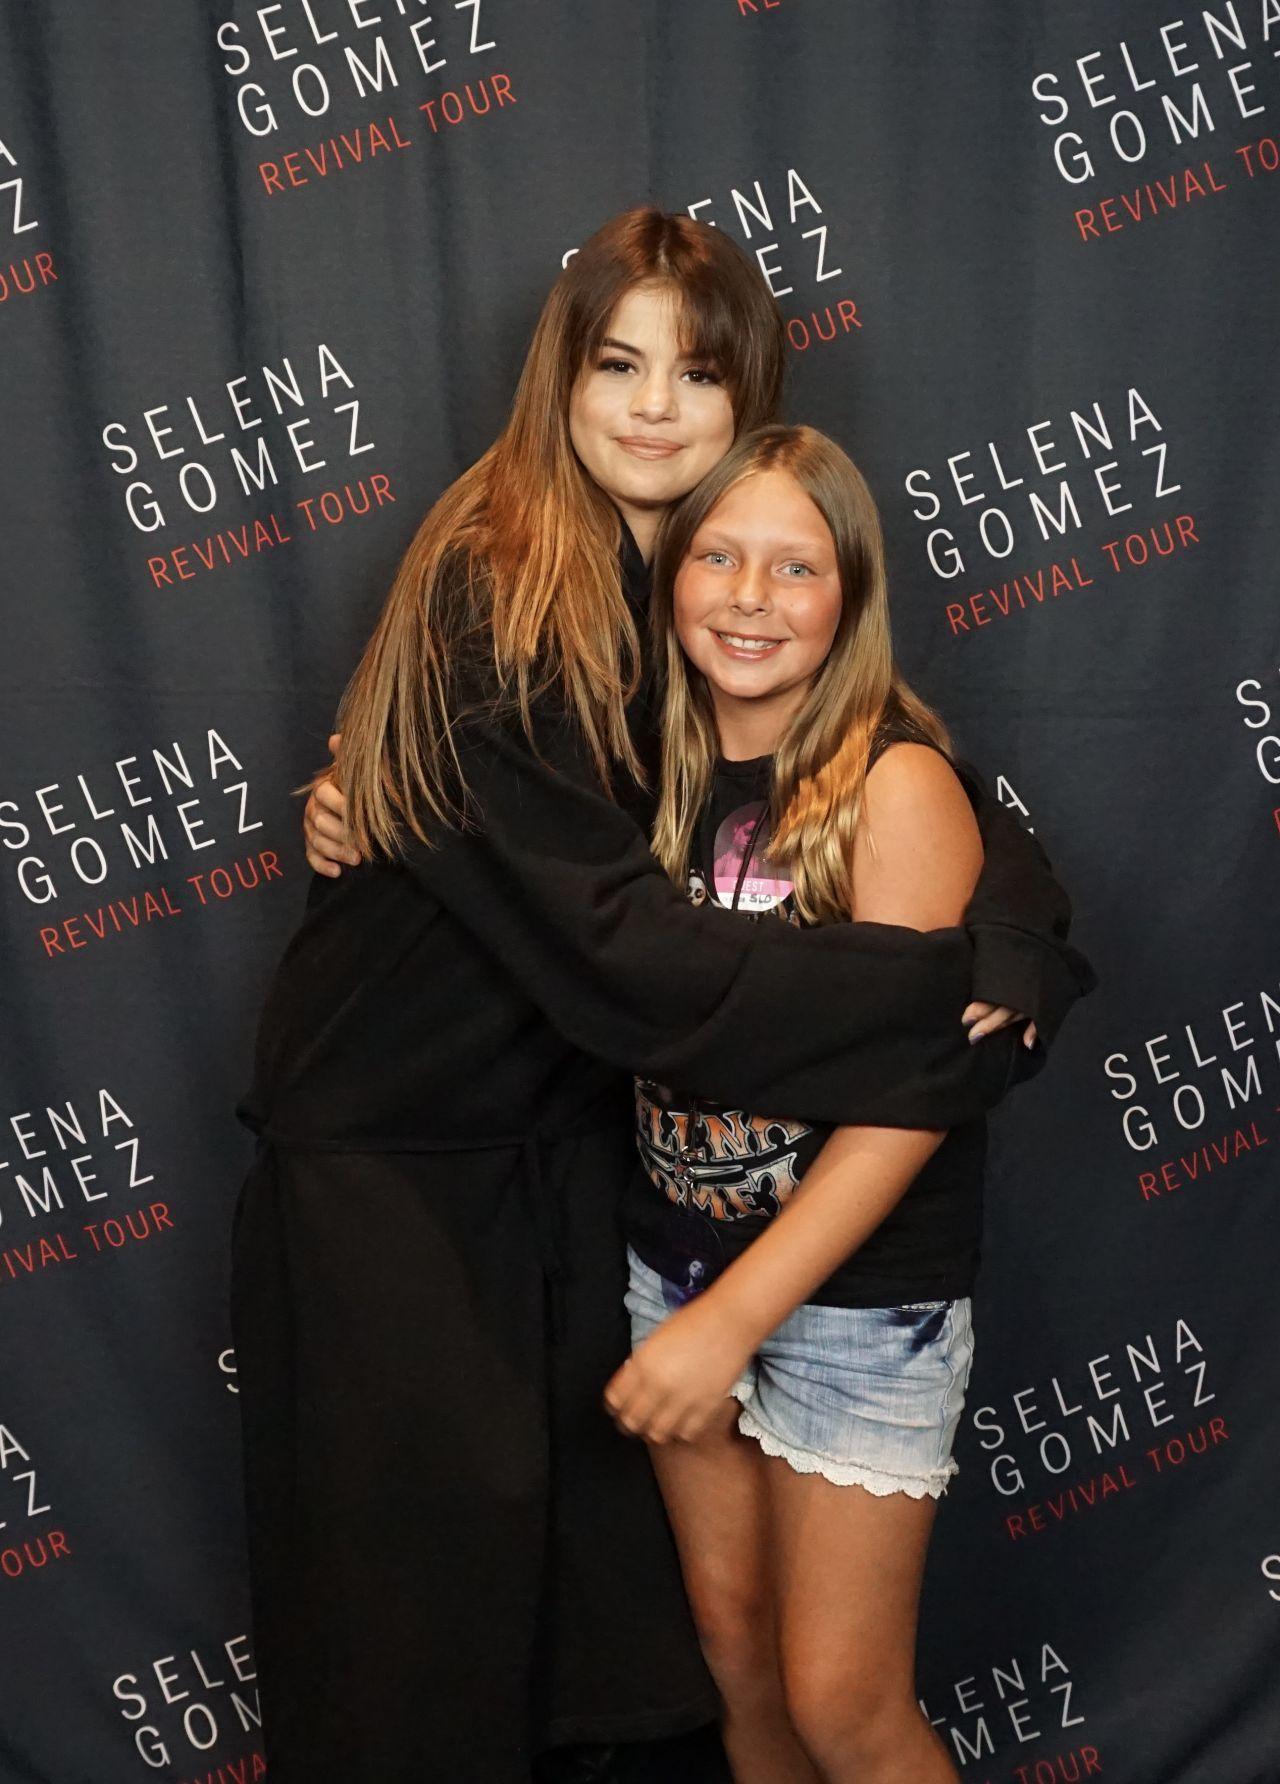 Selena Gomez Revival Tour Meet And Greet Google Search Revival